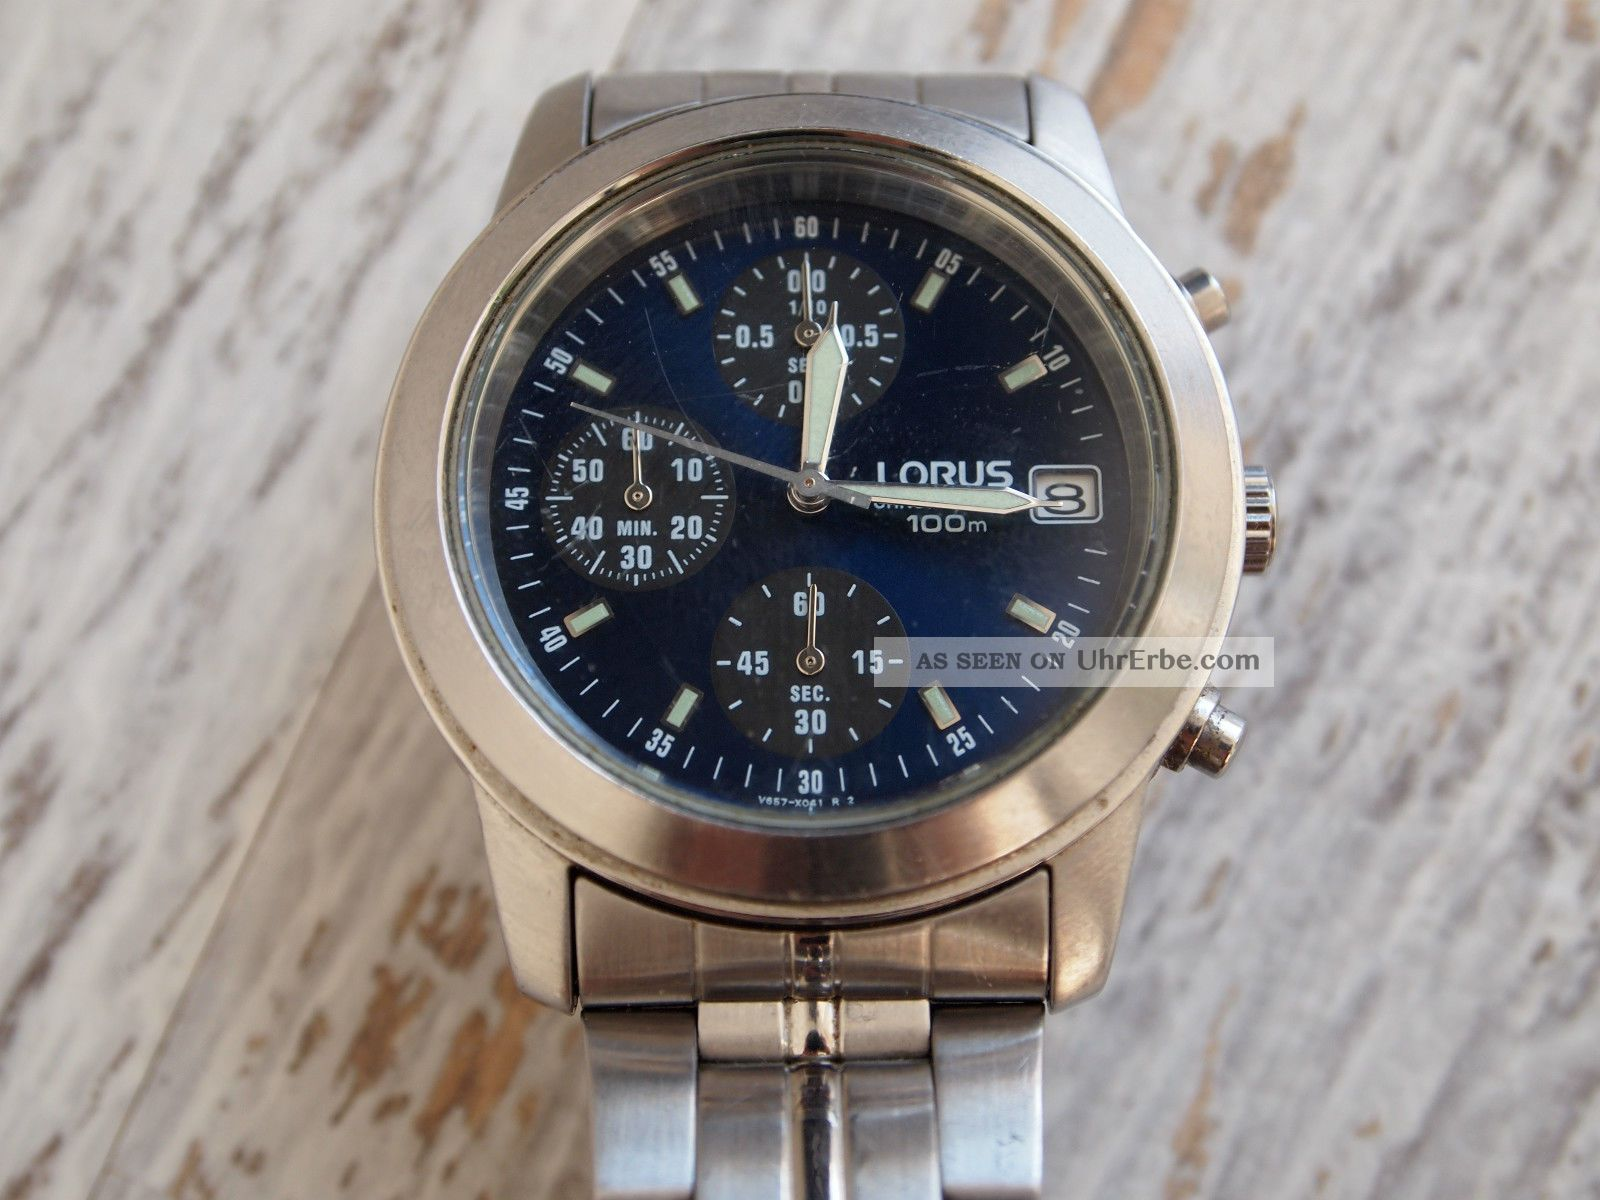 Lorus V657 - X052 Chronograph Armbanduhren Bild